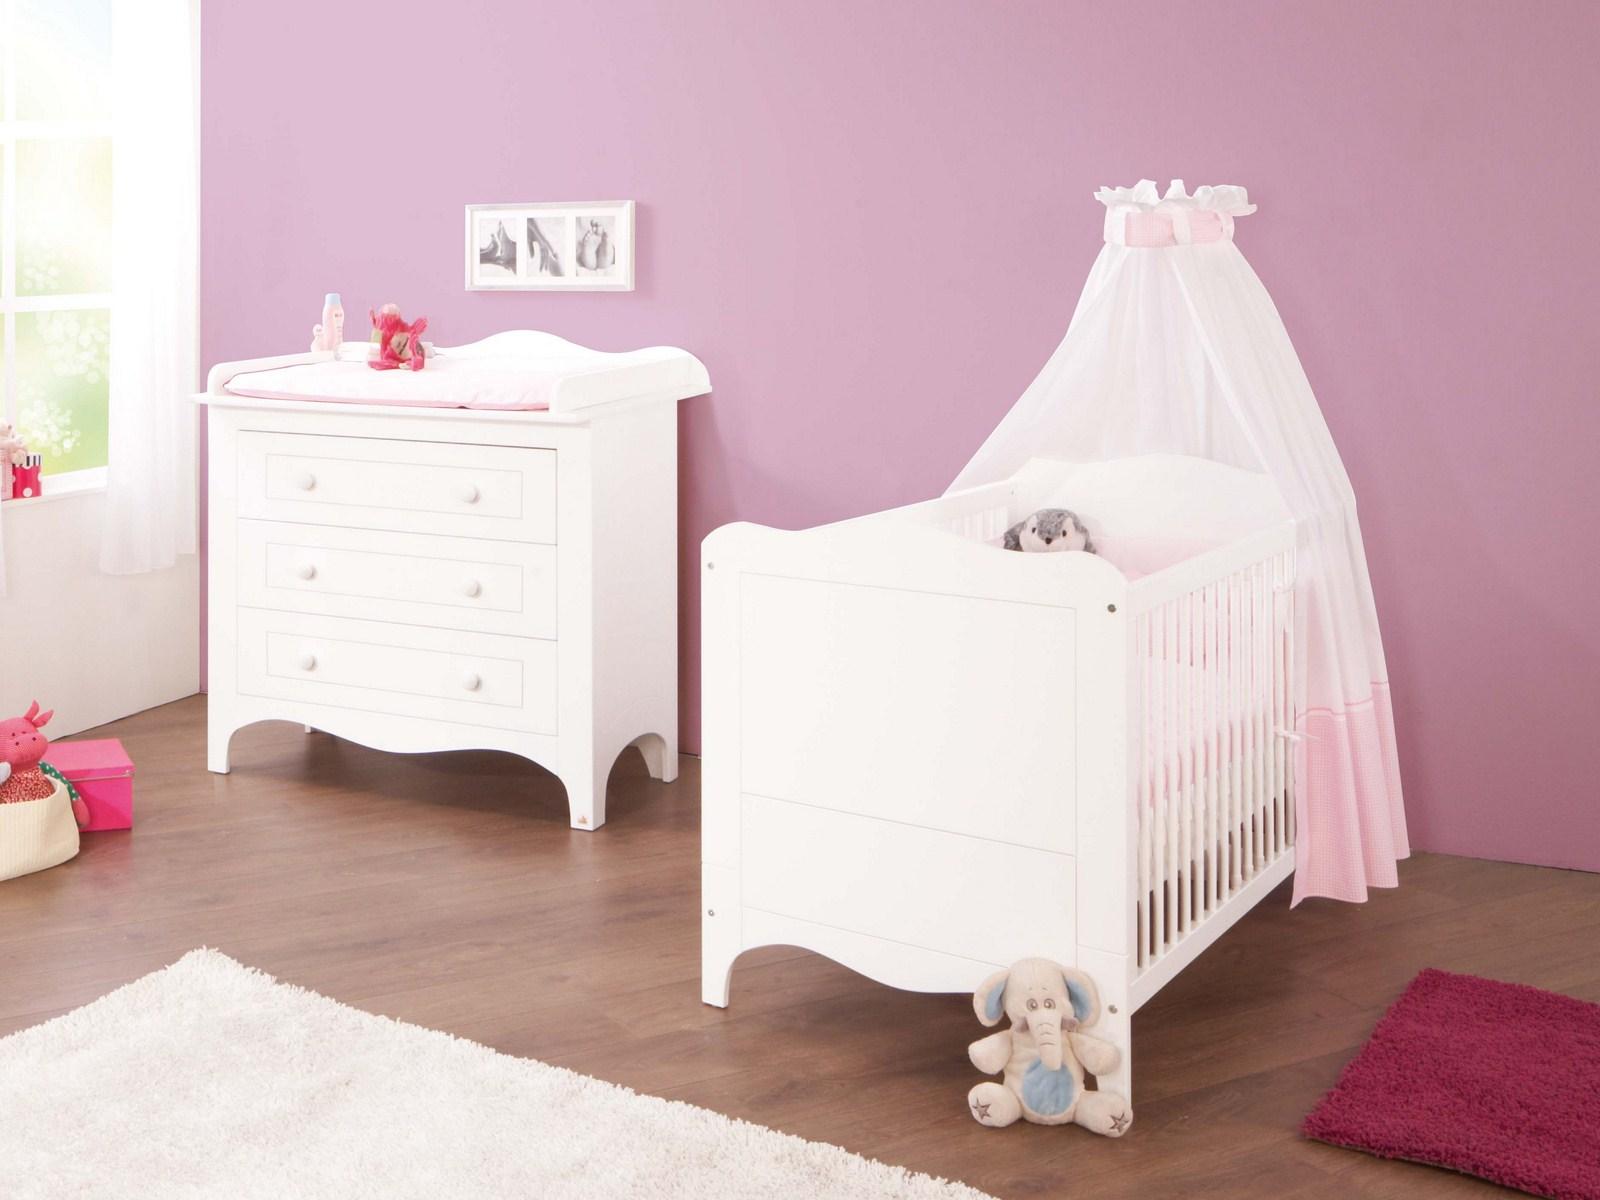 Pinolino Chambre bébé Fleur blanc: Lit évolutif commode à